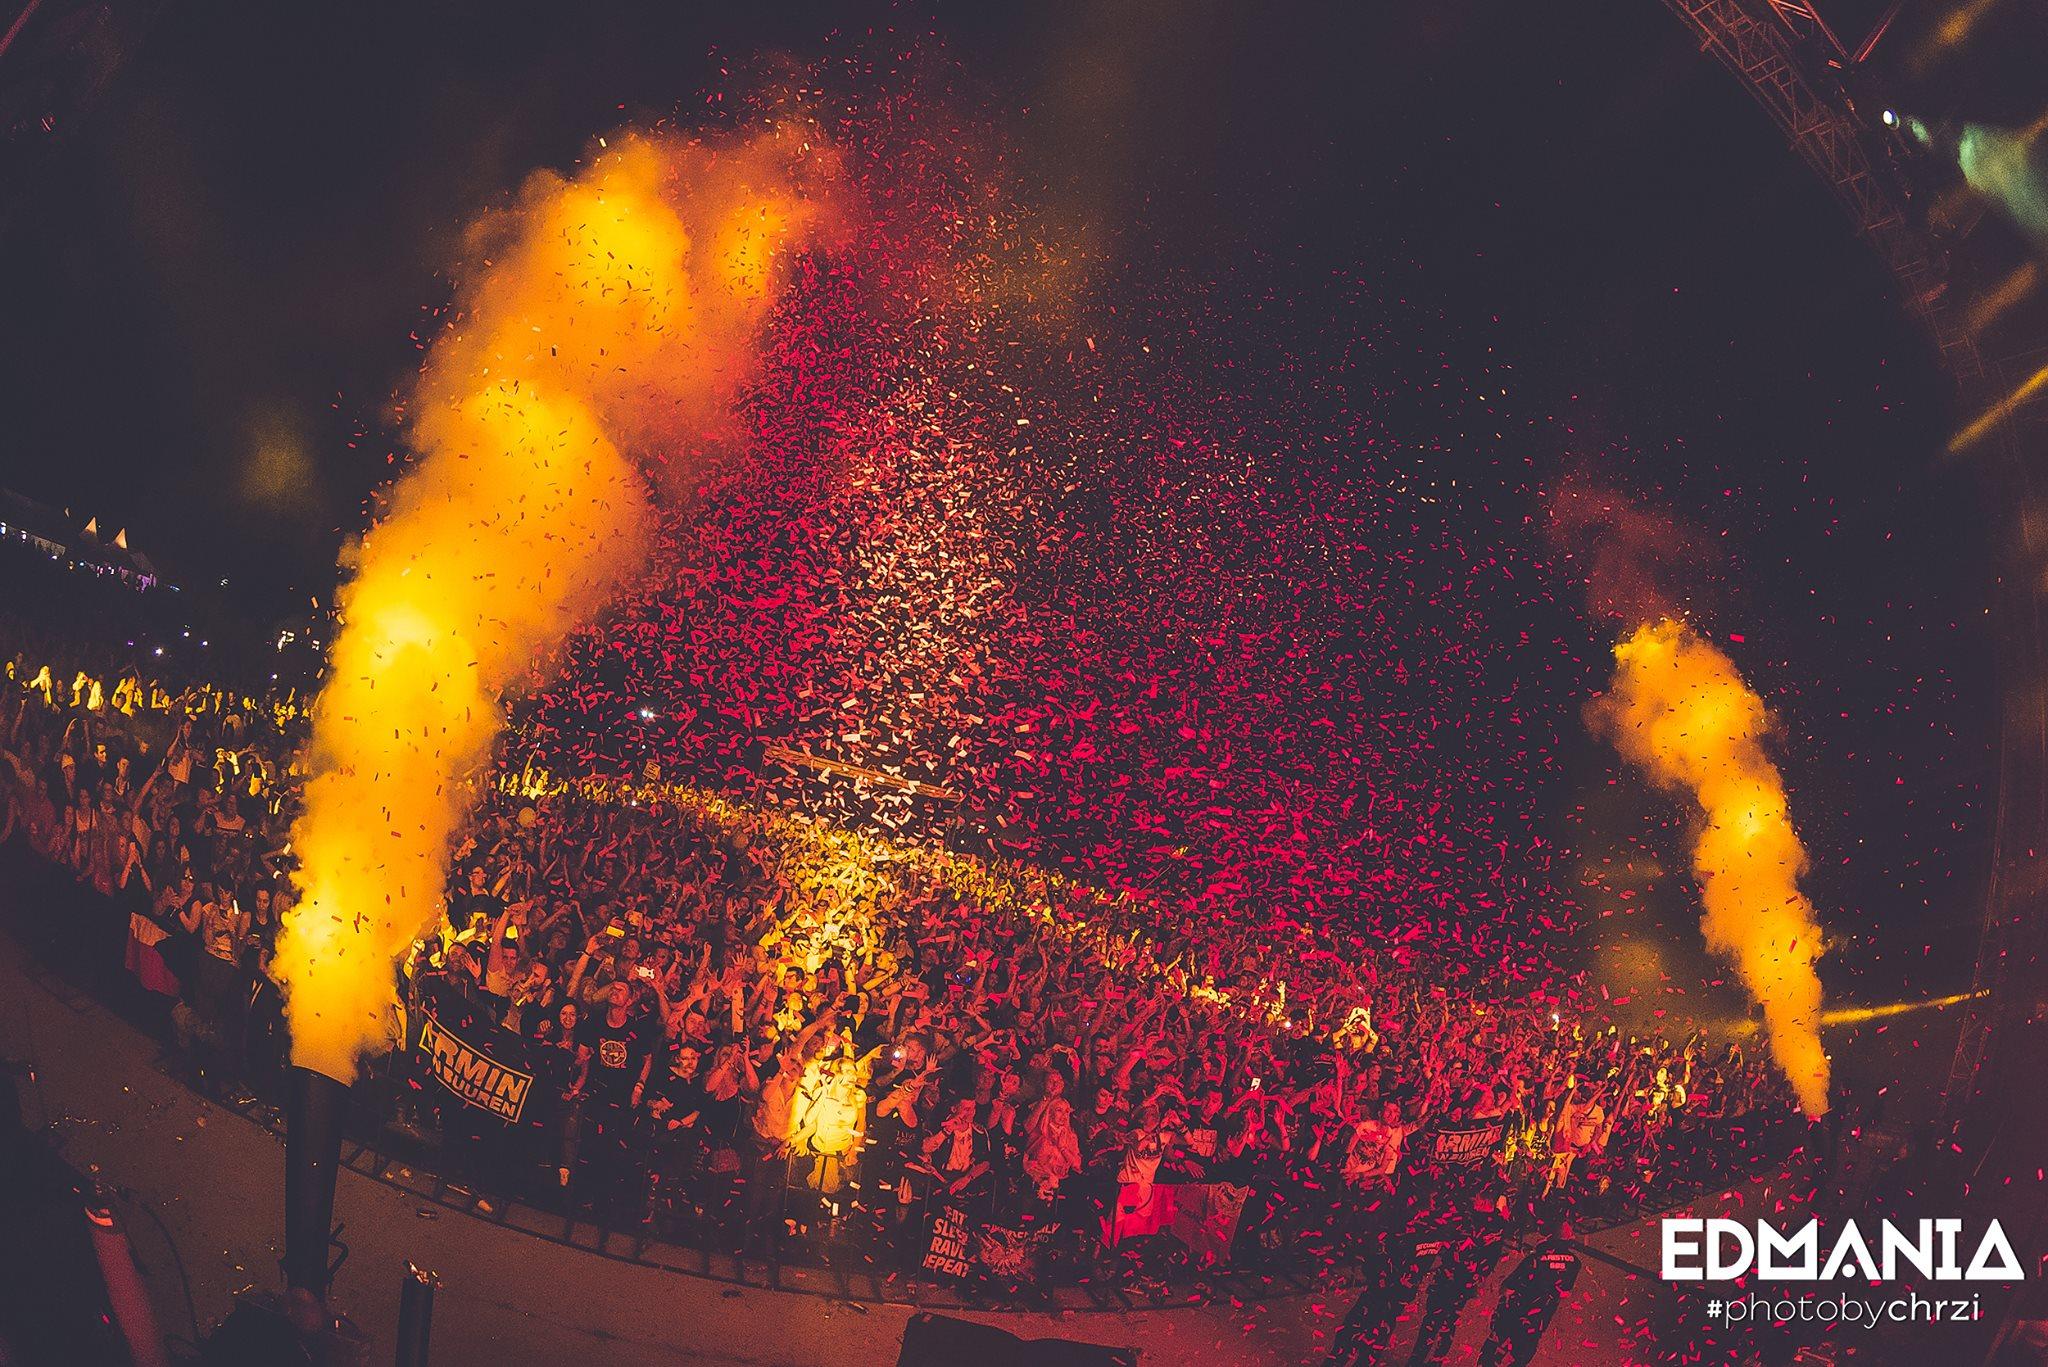 edmania open air 2018 trenczyn trencin trance edm bilety tickets cena sklep buy faq